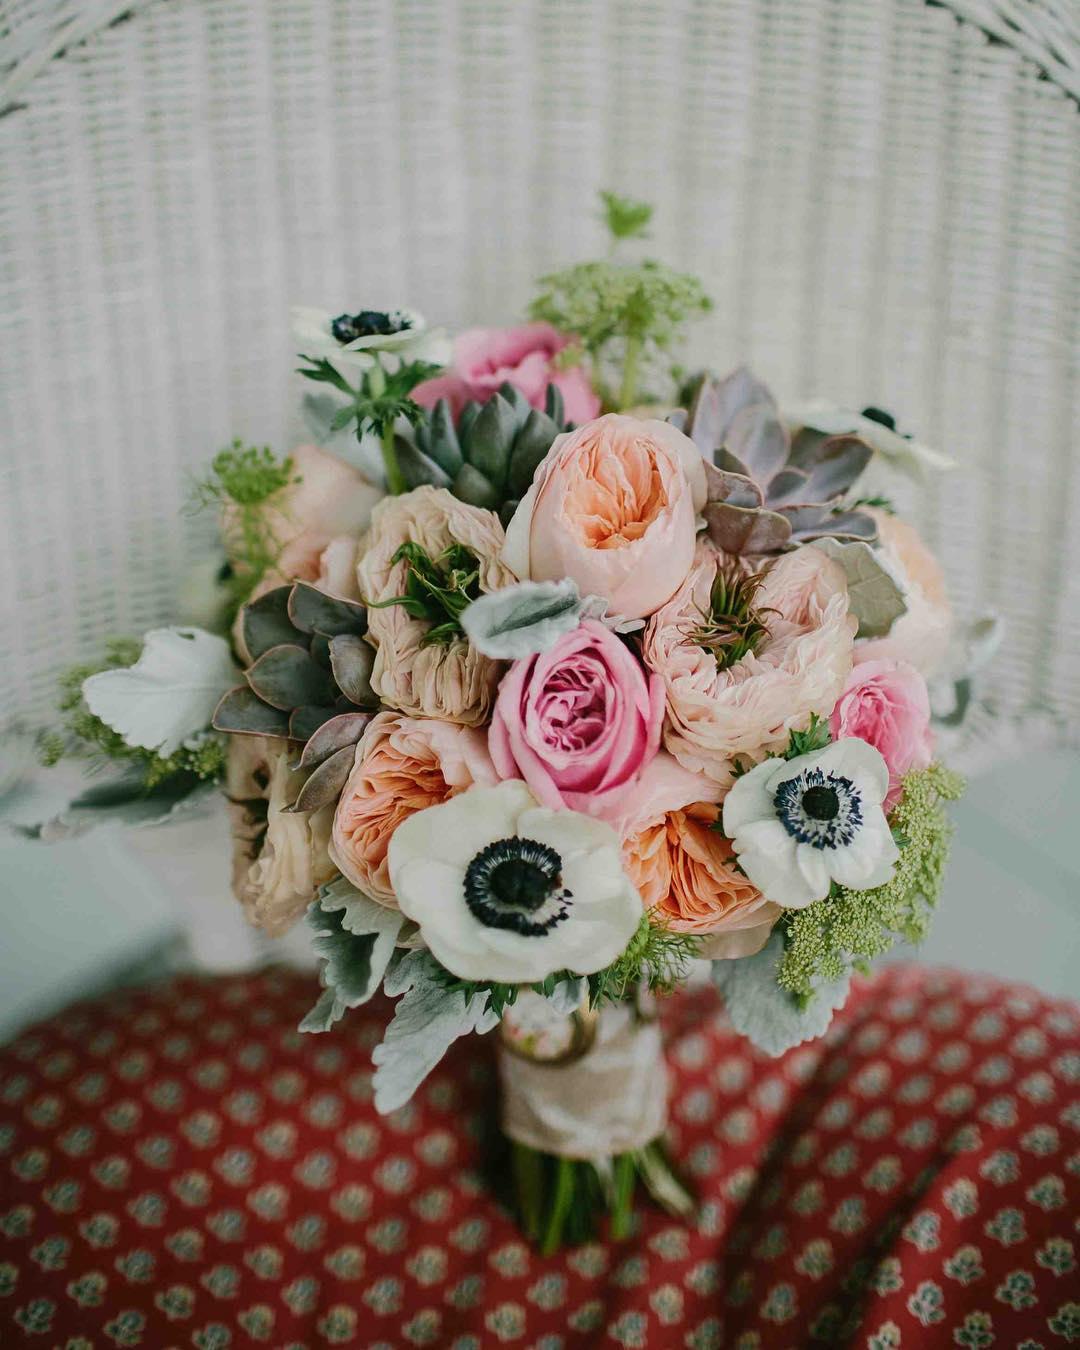 {lovely} photo | @emilydelamater  #bridebling #bouquet #accessory #prettyflowers #barnwedding #kitzfarm #gardenroses #anemones #succulents #lotusfloraldesigns